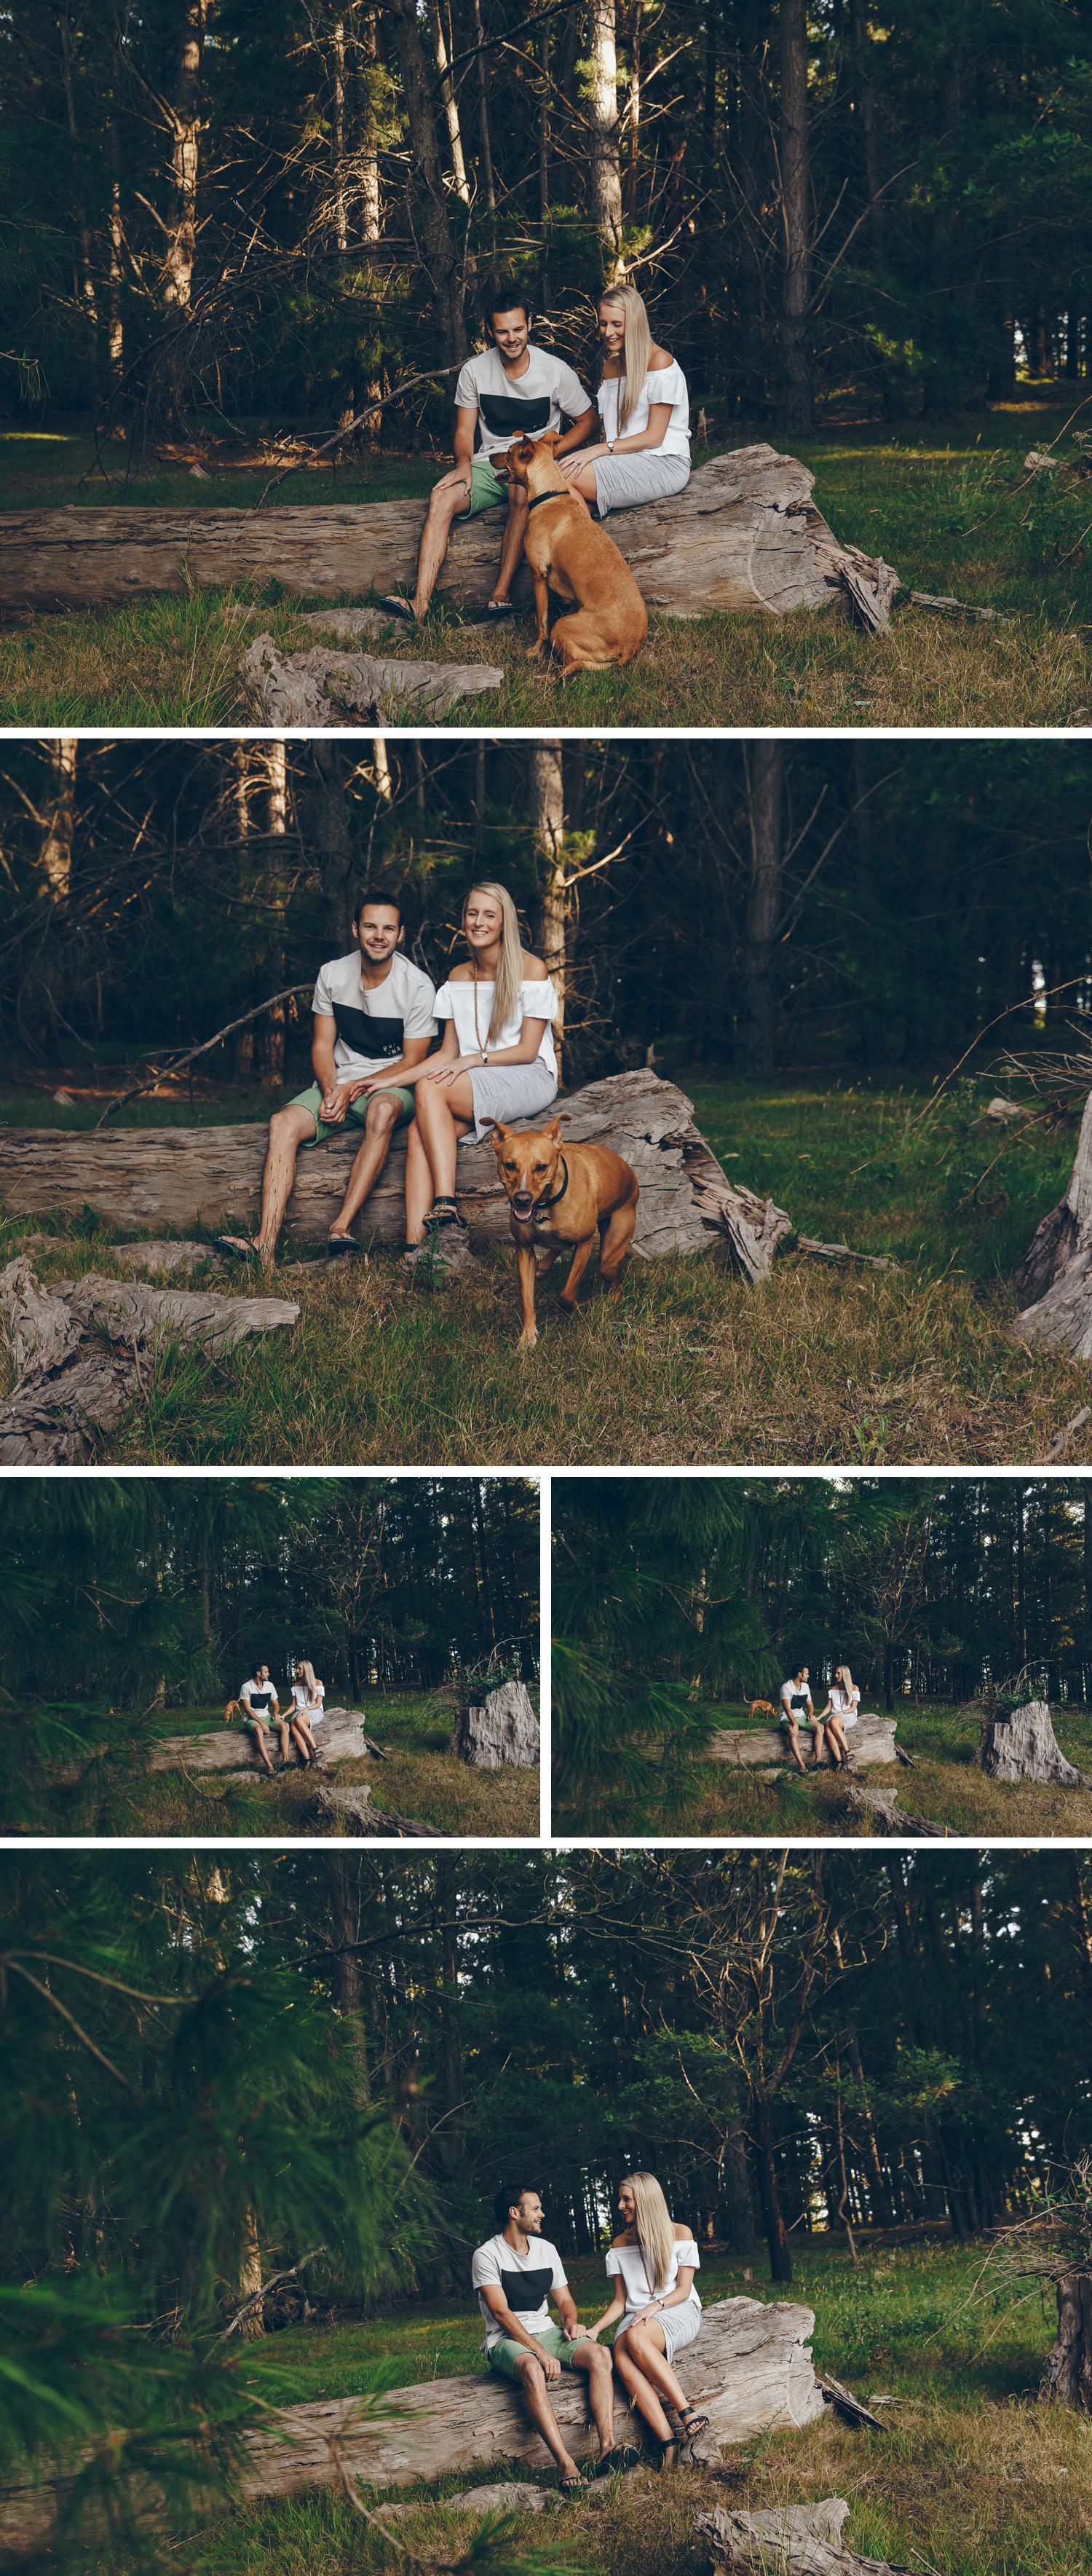 Pine Plantation Gippsland Engagement Shoot, Beautiful Sunset Engagement Shoot Couple Embracing, Beautiful Lighting by Danae Studios